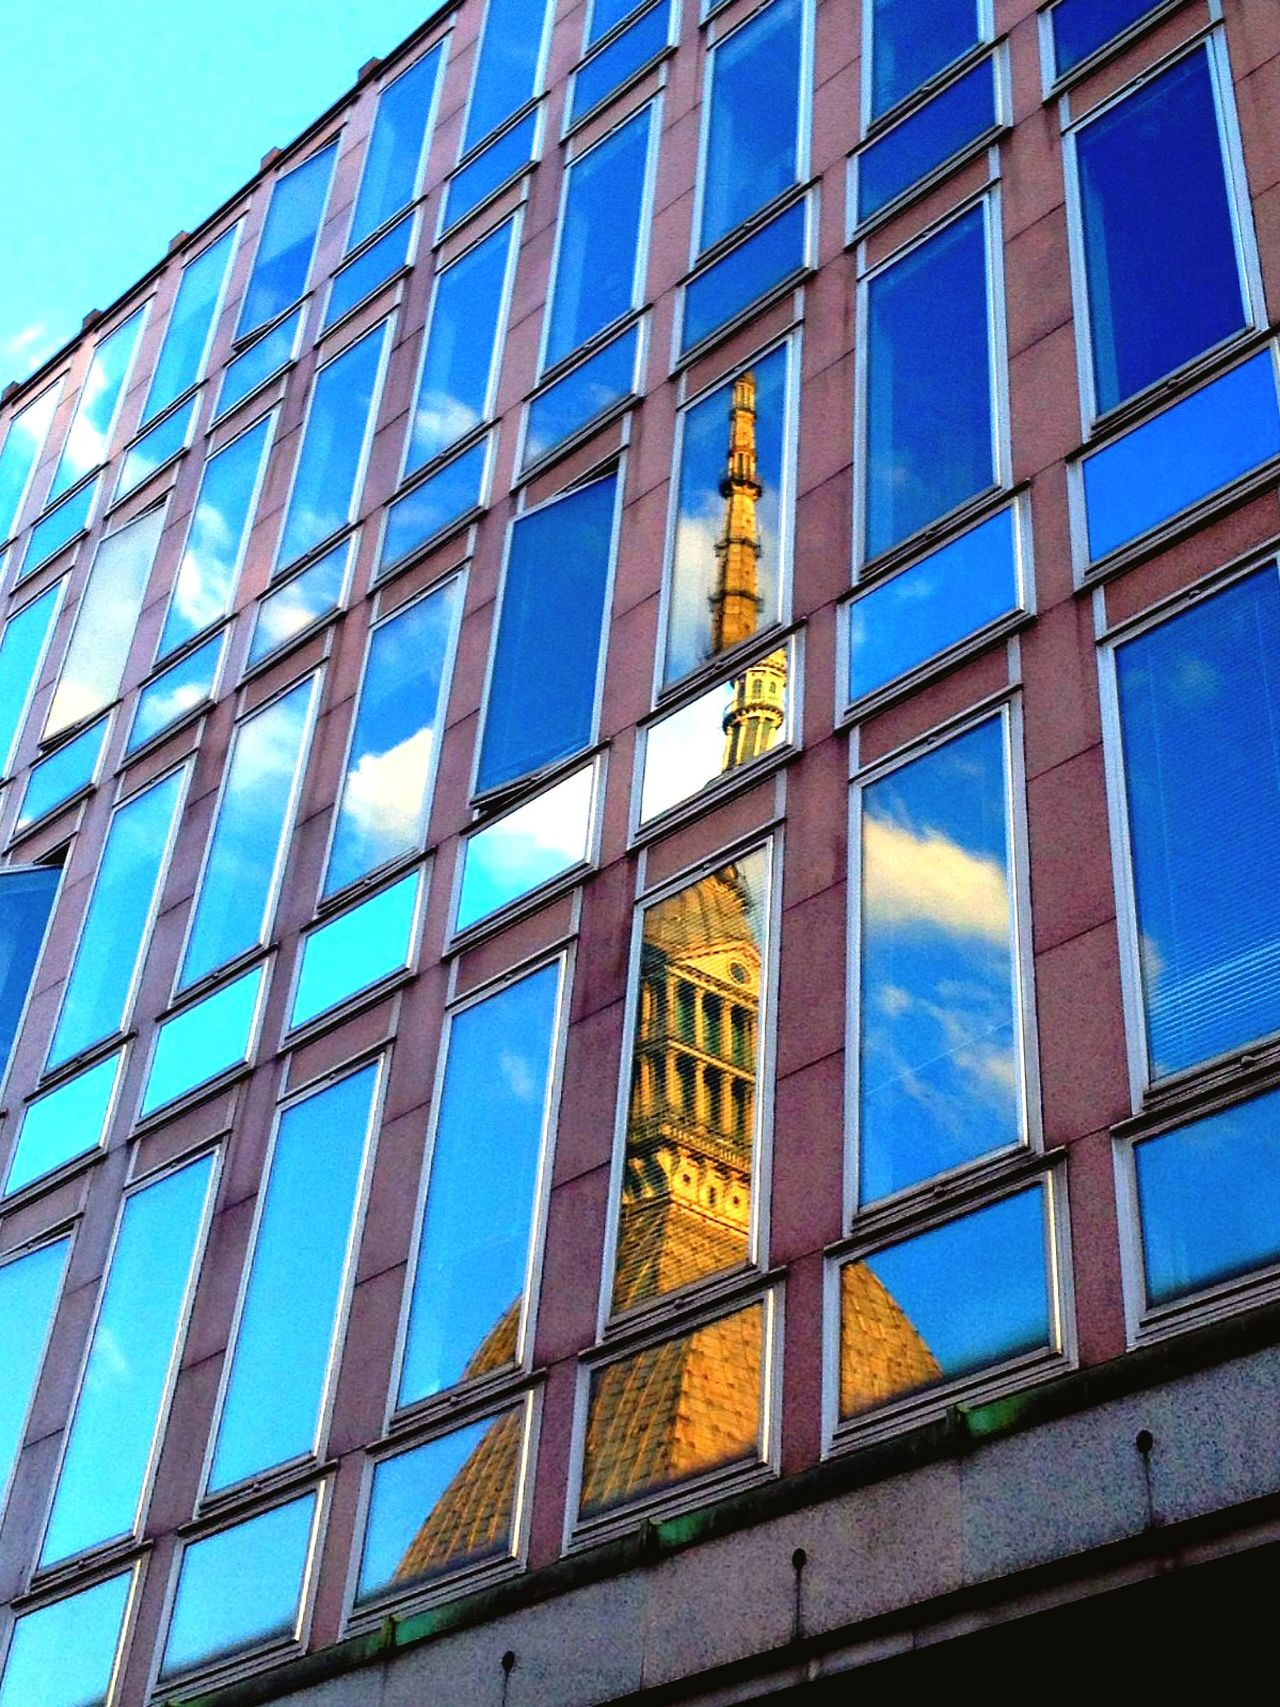 Mole Antonelliana Torino Torino ❤ Torino , La Mole Turin Italy Torinoélamiacittá Sky No People Architecture Windows Riflessi Turin NoPeopleAround Cloud - Sky Riflesso Reflection Reflections Reflection Photography Reflection_collection